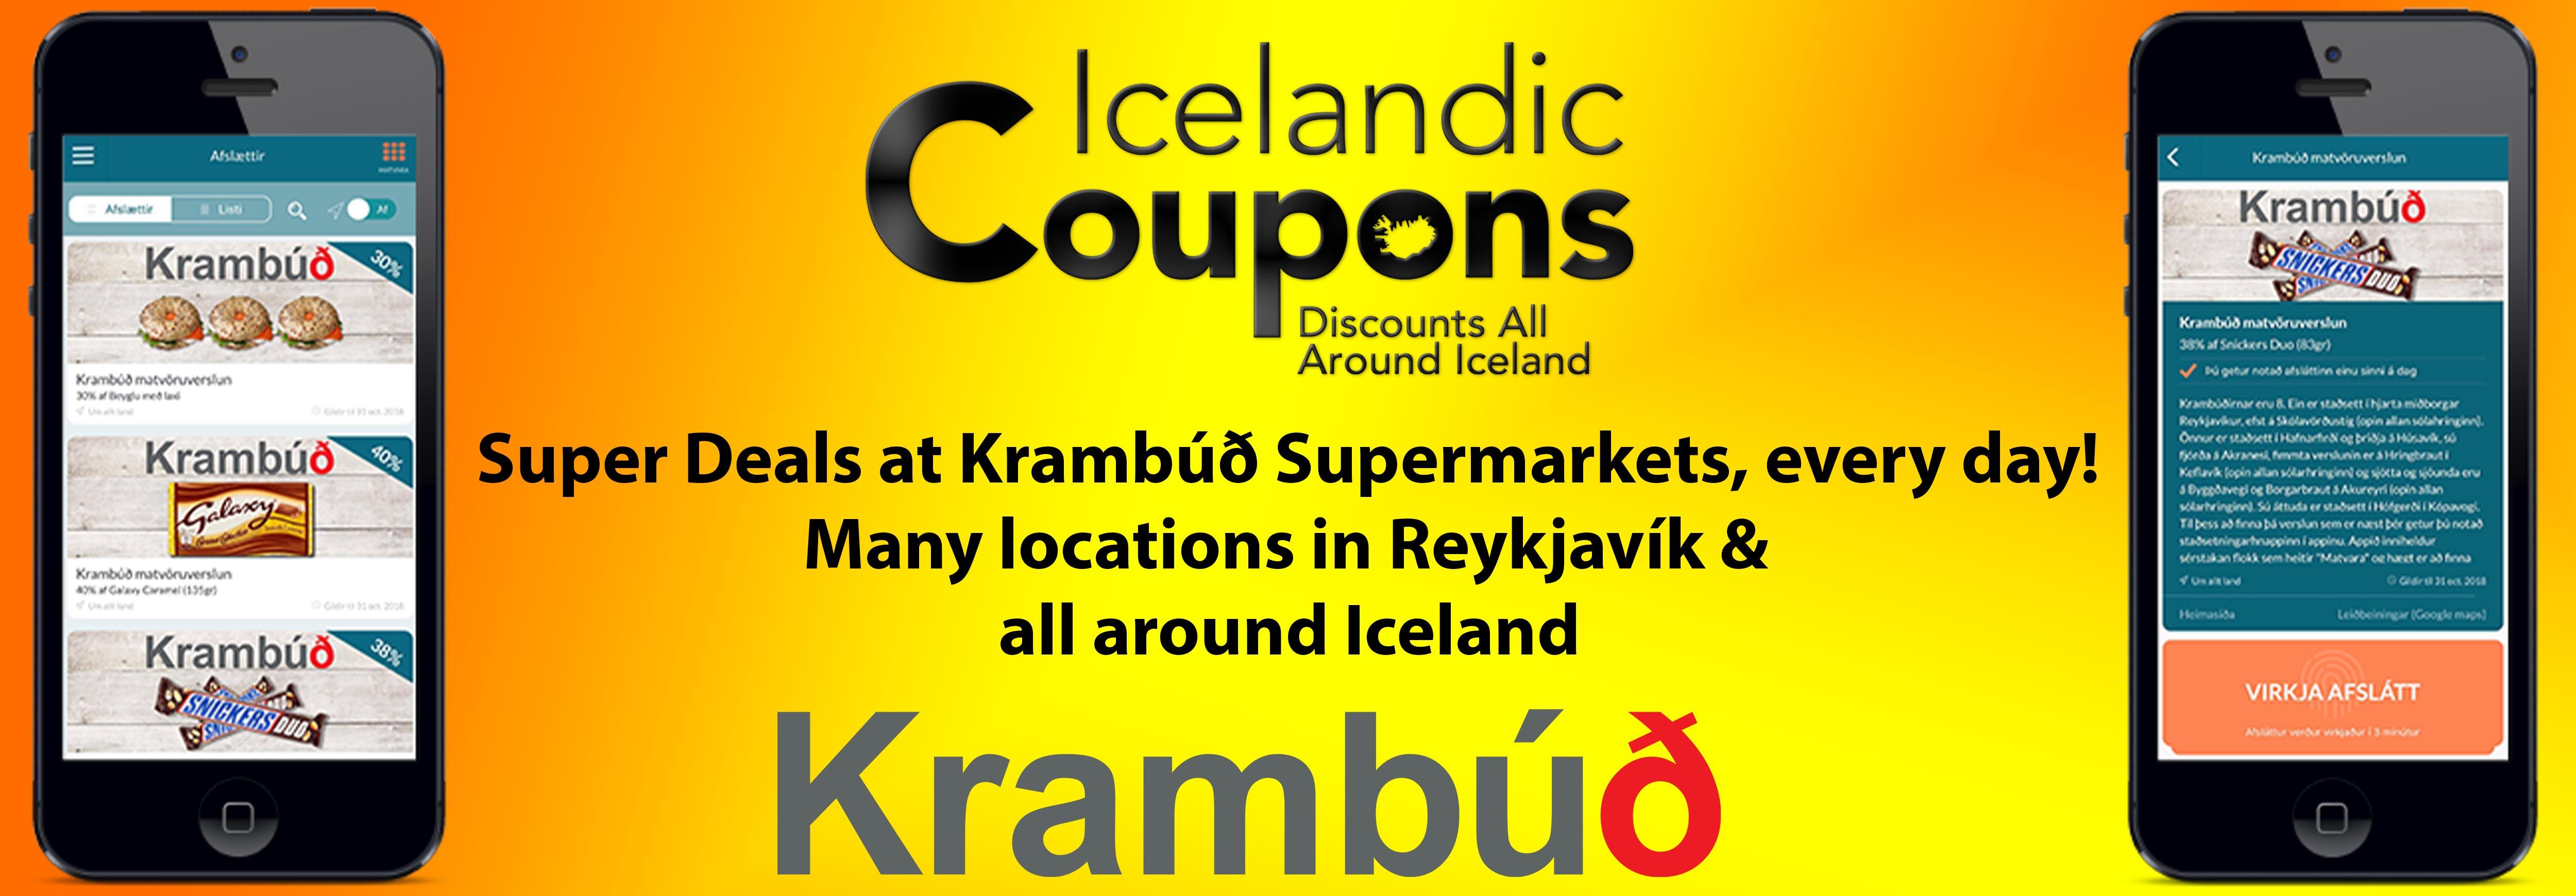 super deals in iceland